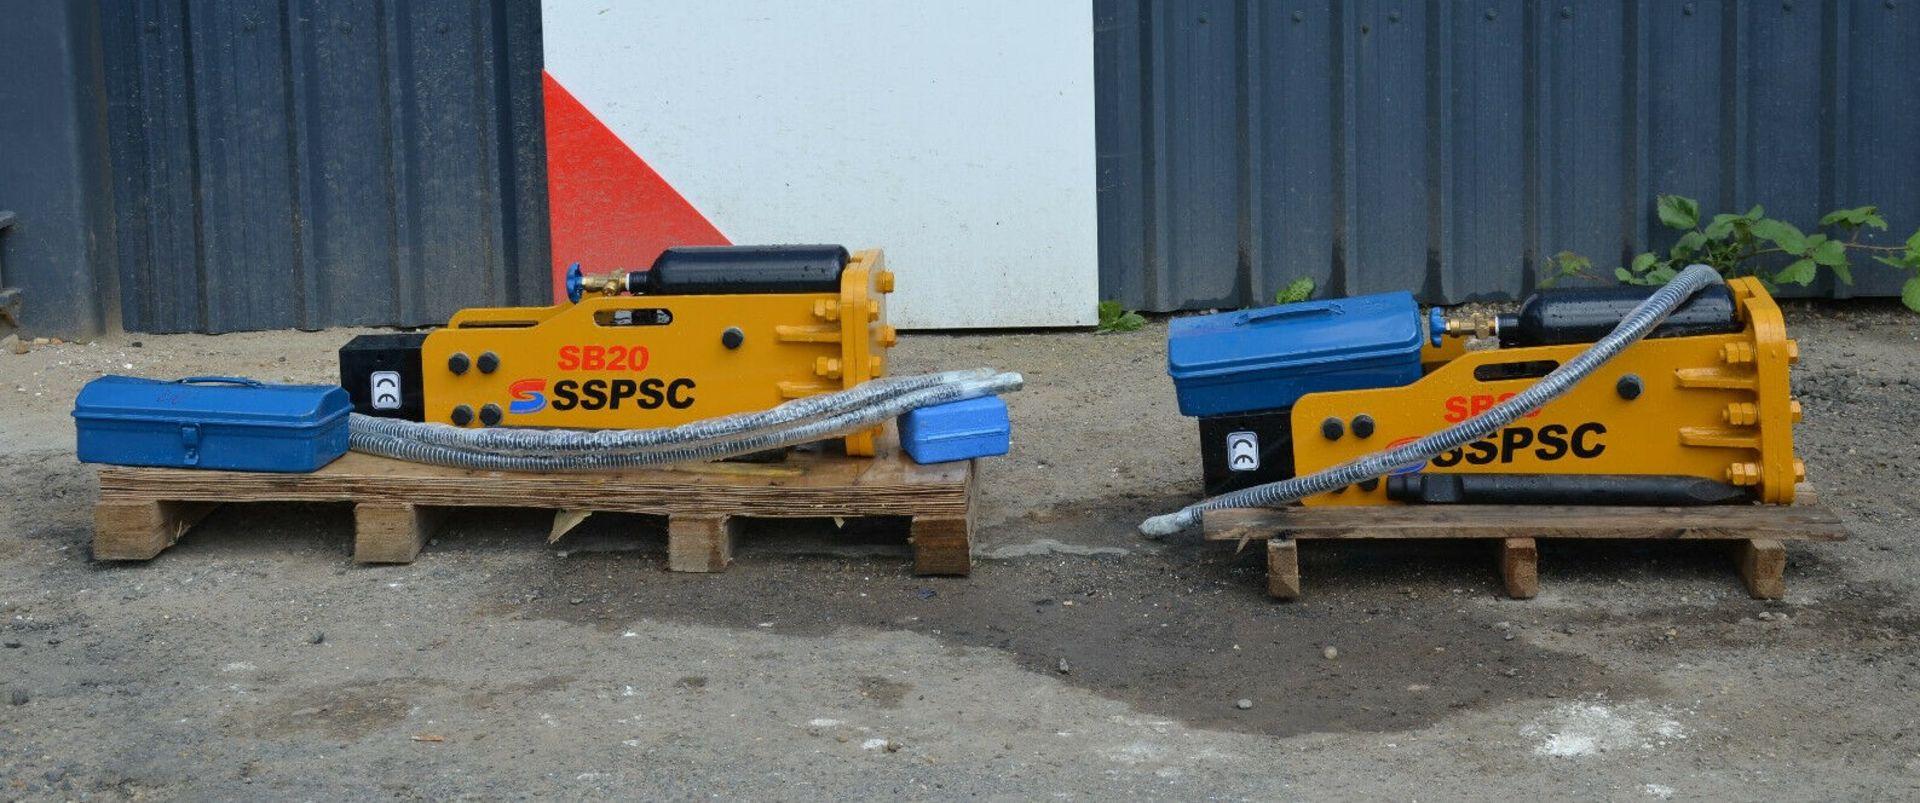 SSPSC SB20 Hydraulic Breaker - Image 6 of 6